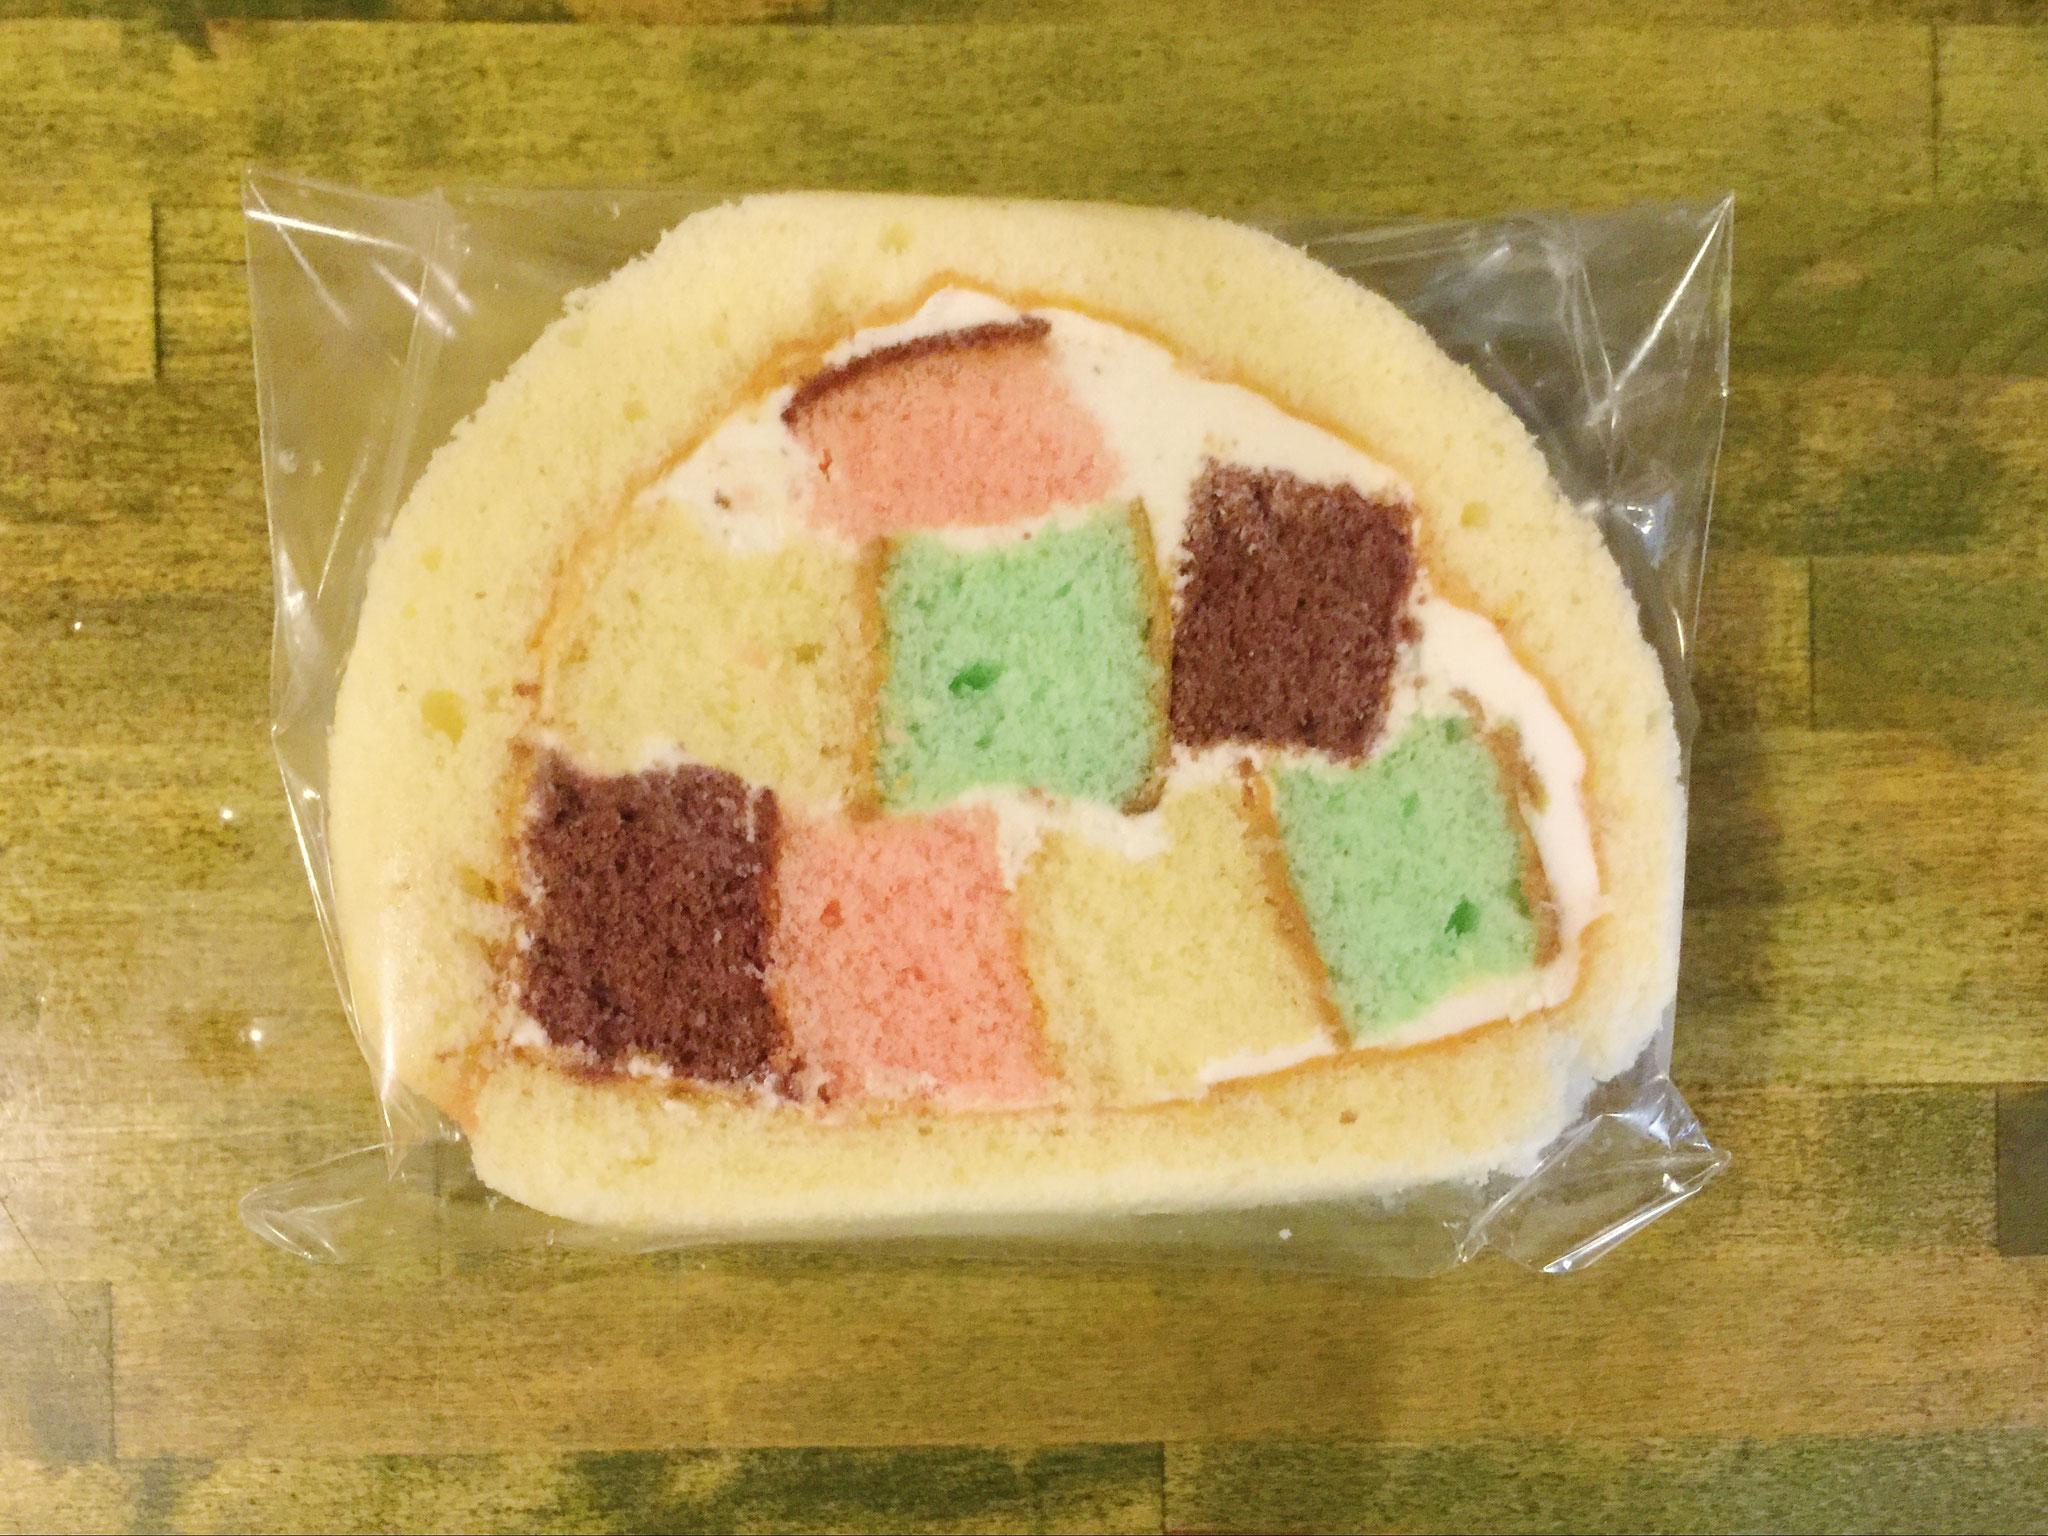 Rainbow Roll - $1.75